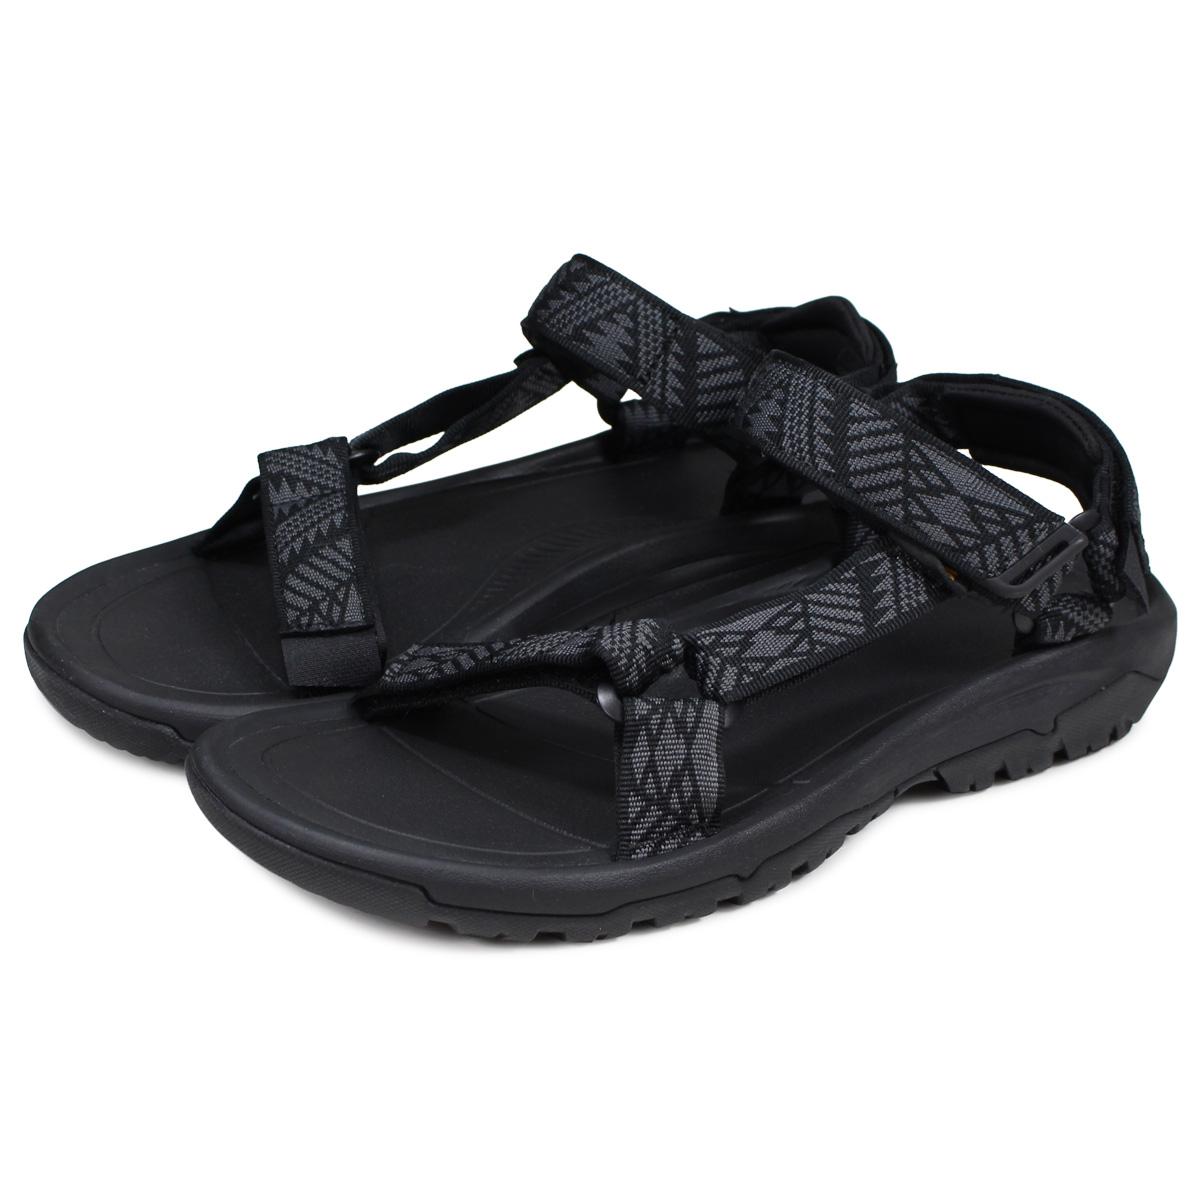 ALLSPORTS: Teva HURRICANE tebasandaruhariken XLT 2運動涼鞋人黑色藍色深藍多黑1019234   日本樂天市場